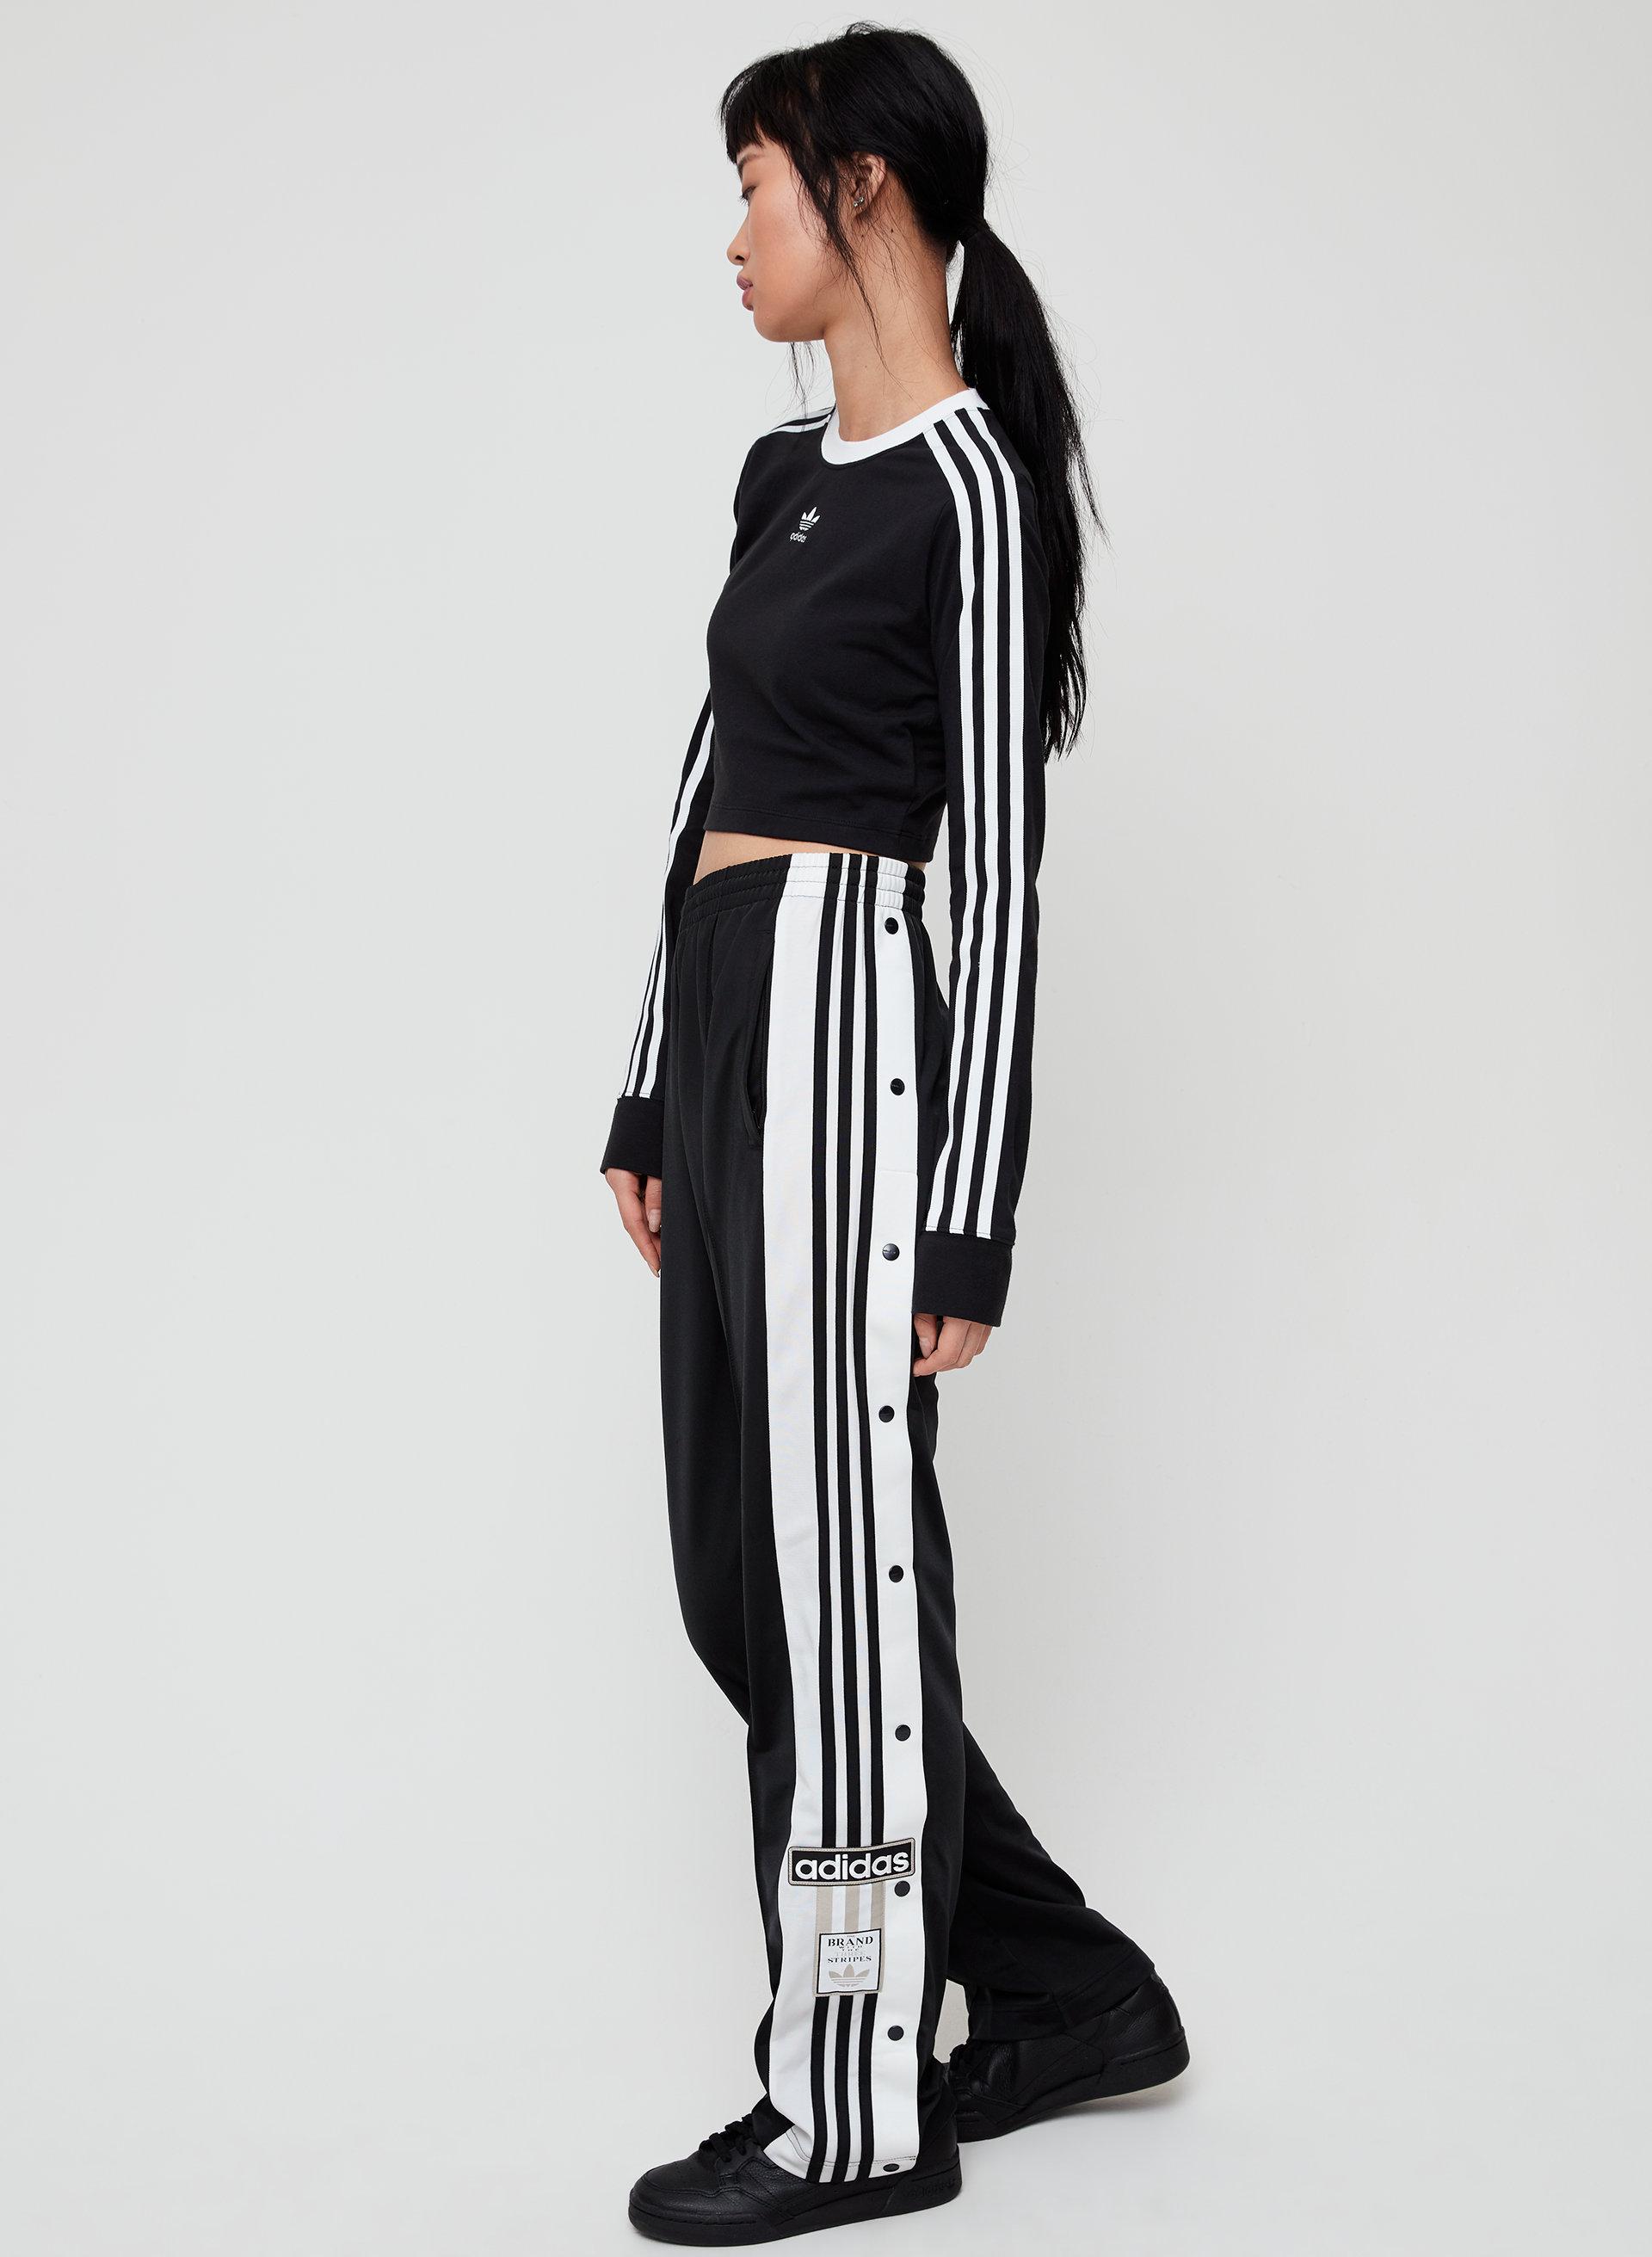 wholesale dealer fdad7 f2ff9 ... adidas OG ADIBREAK TRACK PANT   Aritzia ...